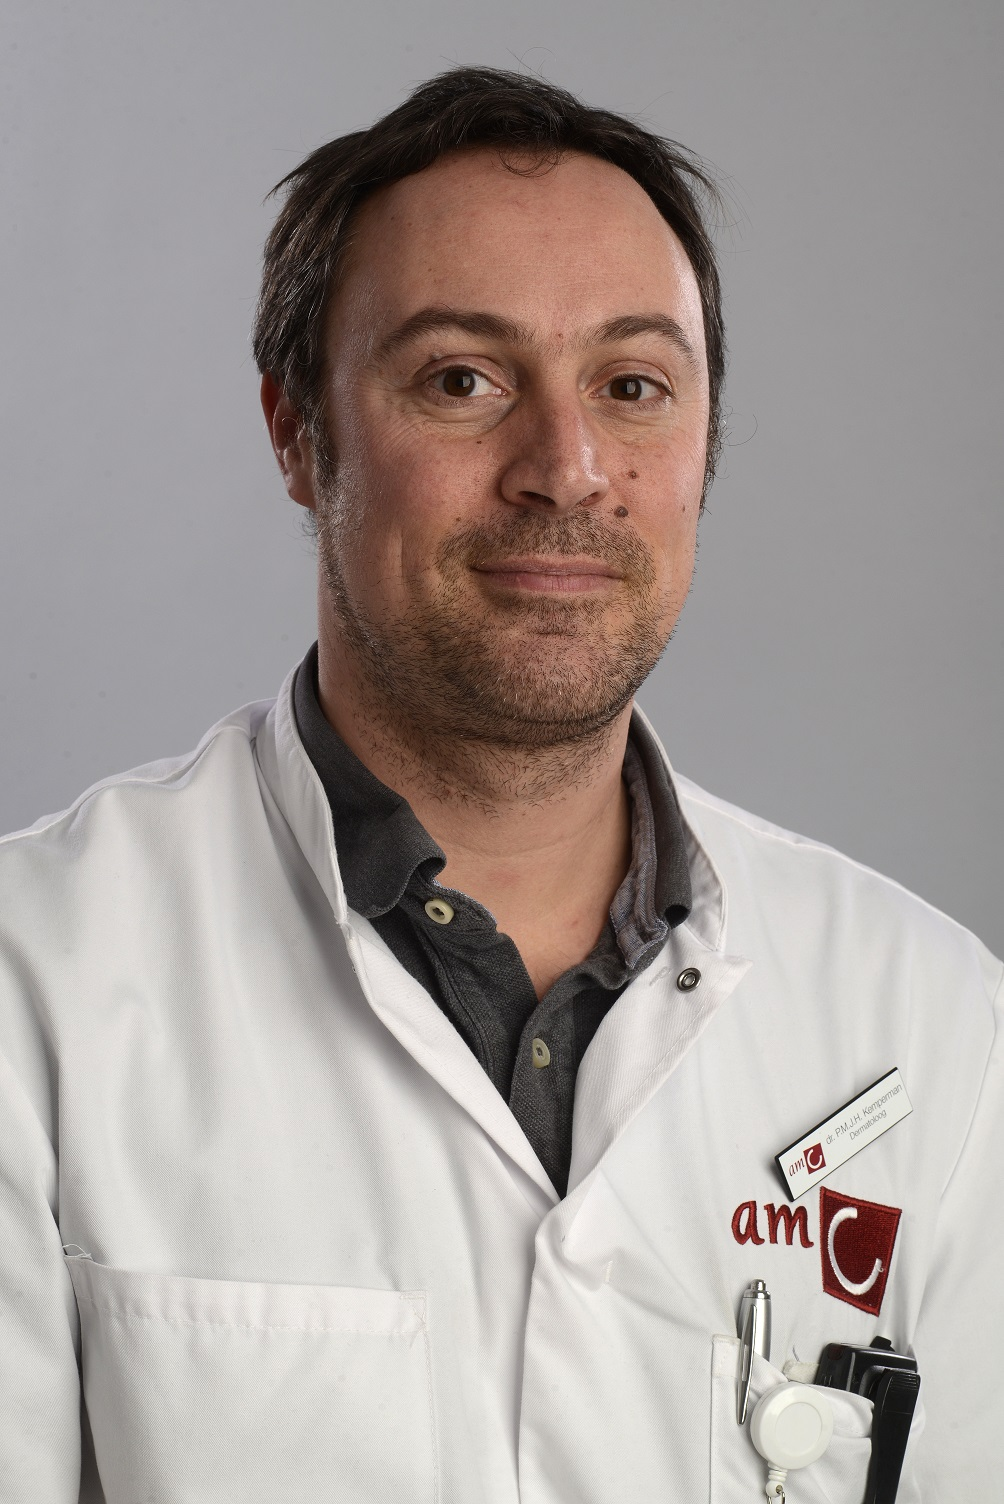 Dr. Patrick Kemperman